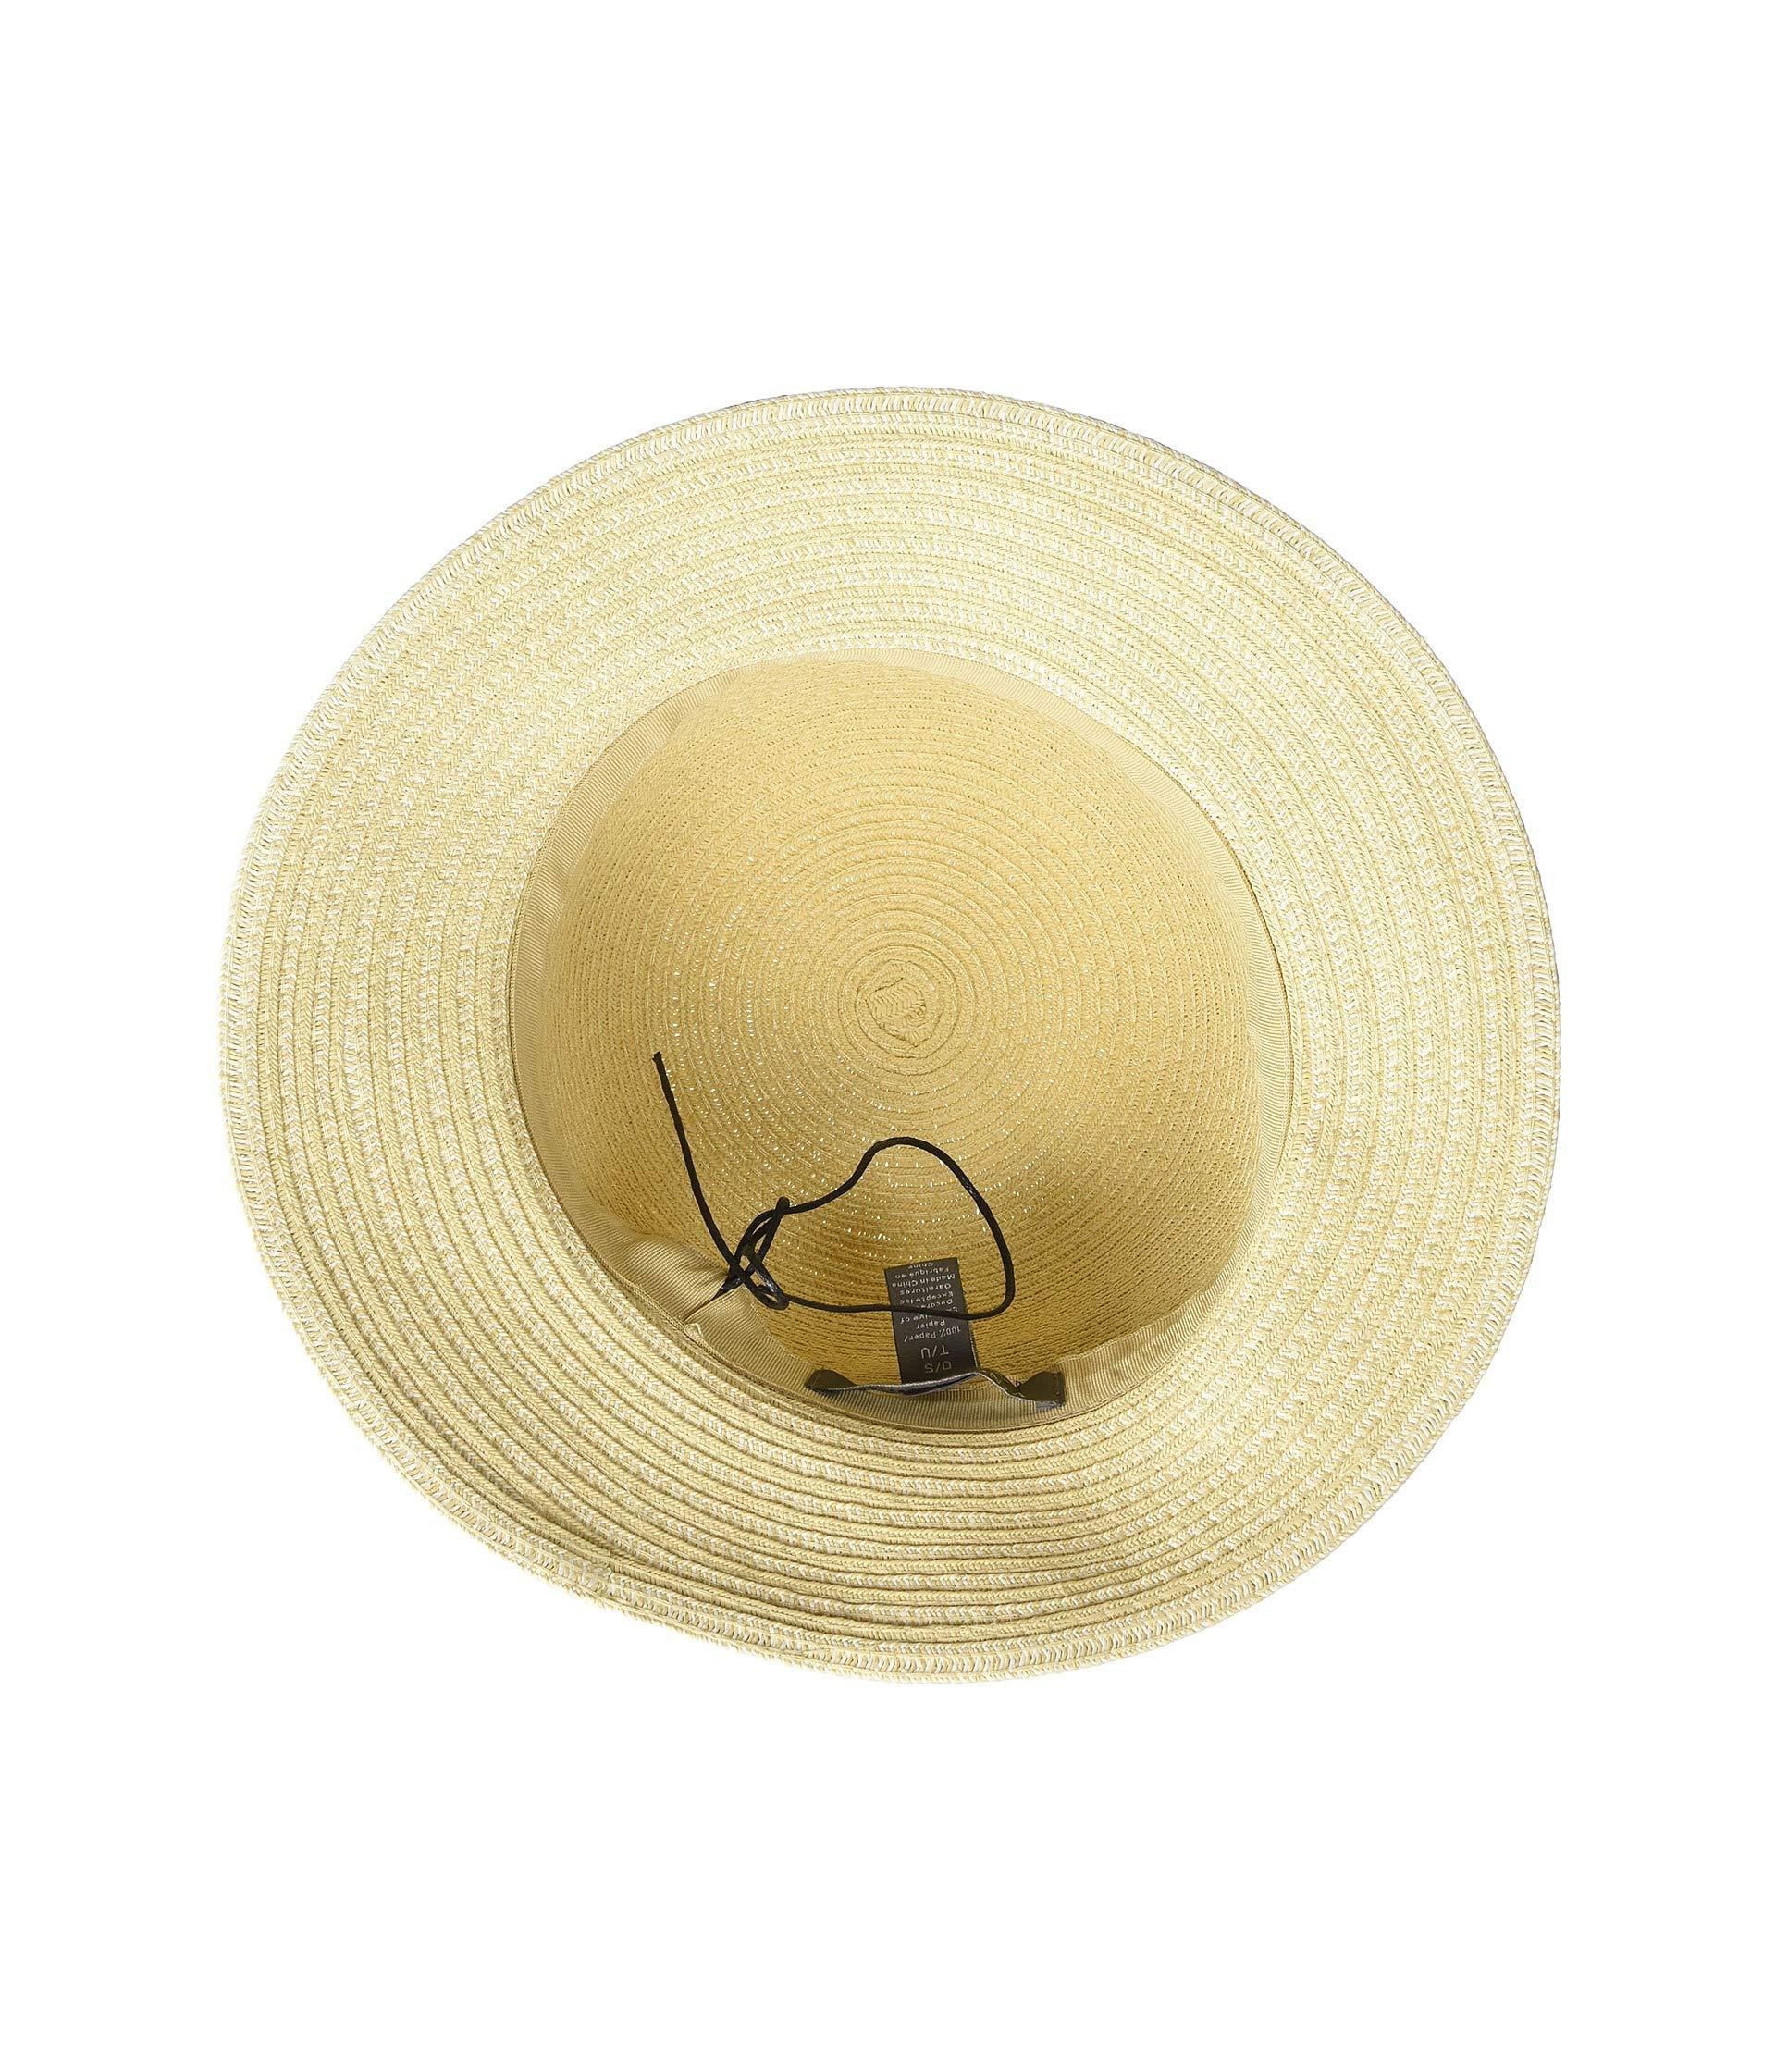 d8a17b877 Lyst - Vince Camuto Stripe Grosgrain Cloche (shell) Caps